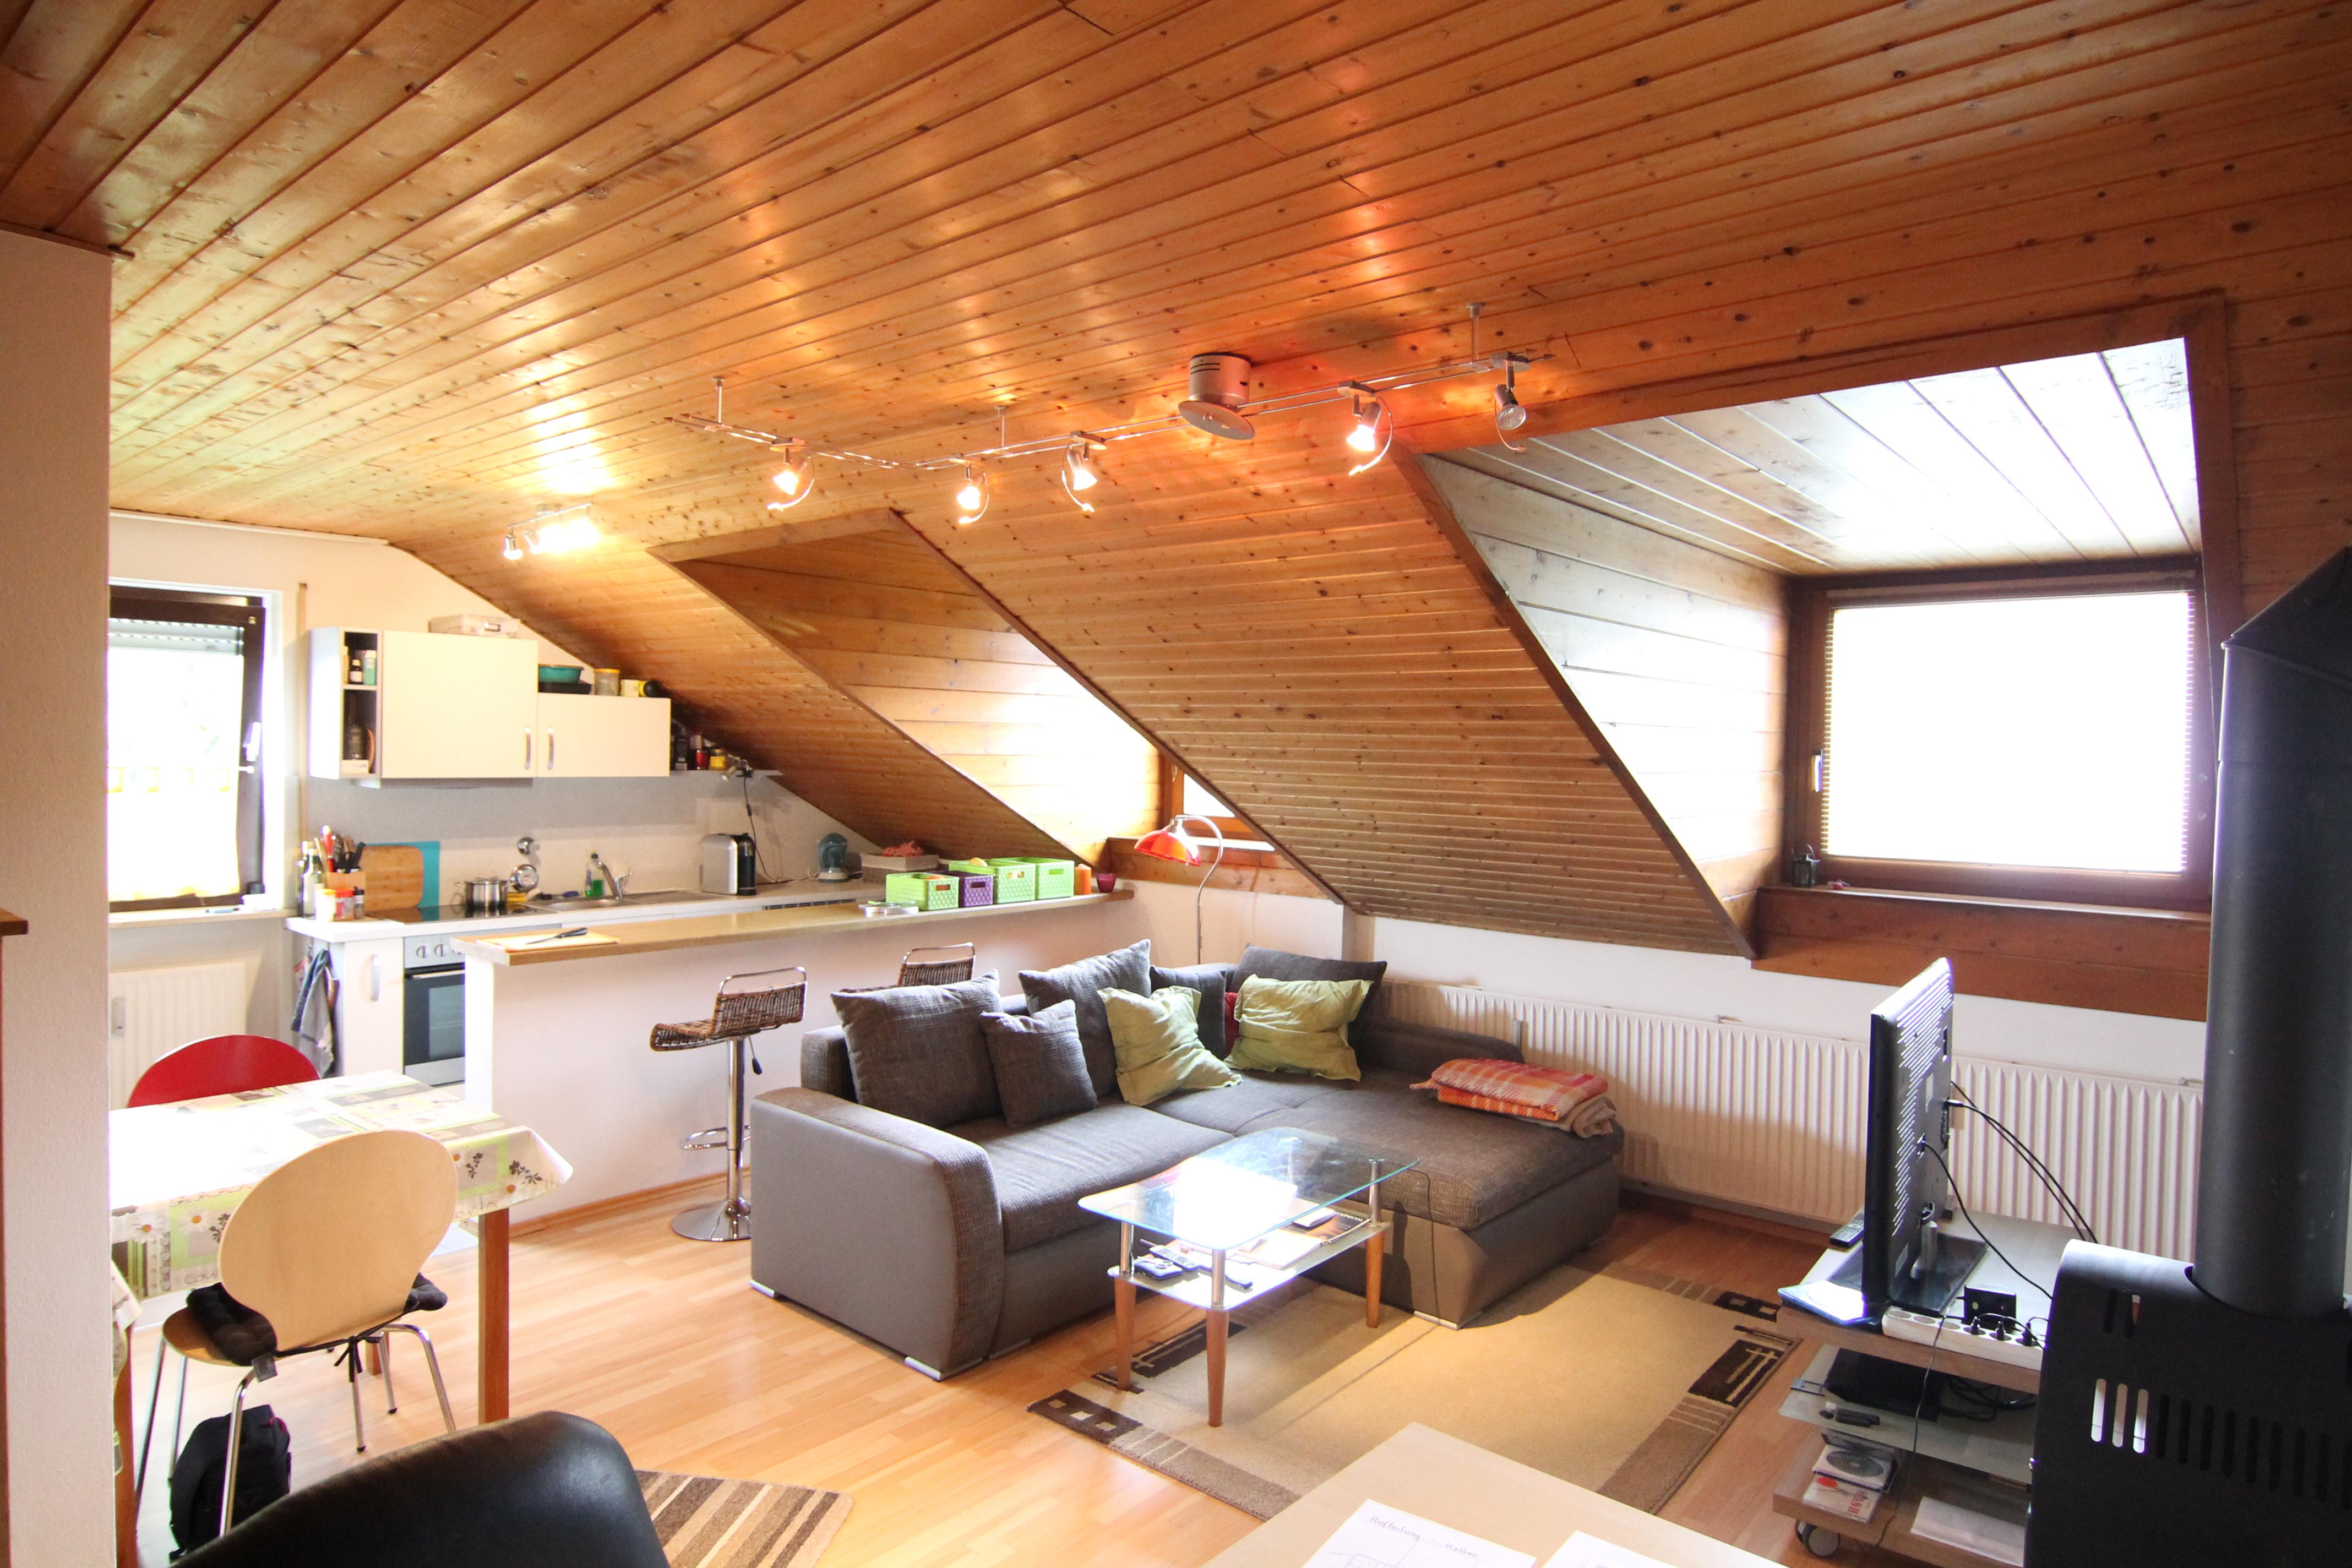 GEMTLICH UNTERM DACH Gepflegte 2 Zimmer Dachgeschoss Wohnung